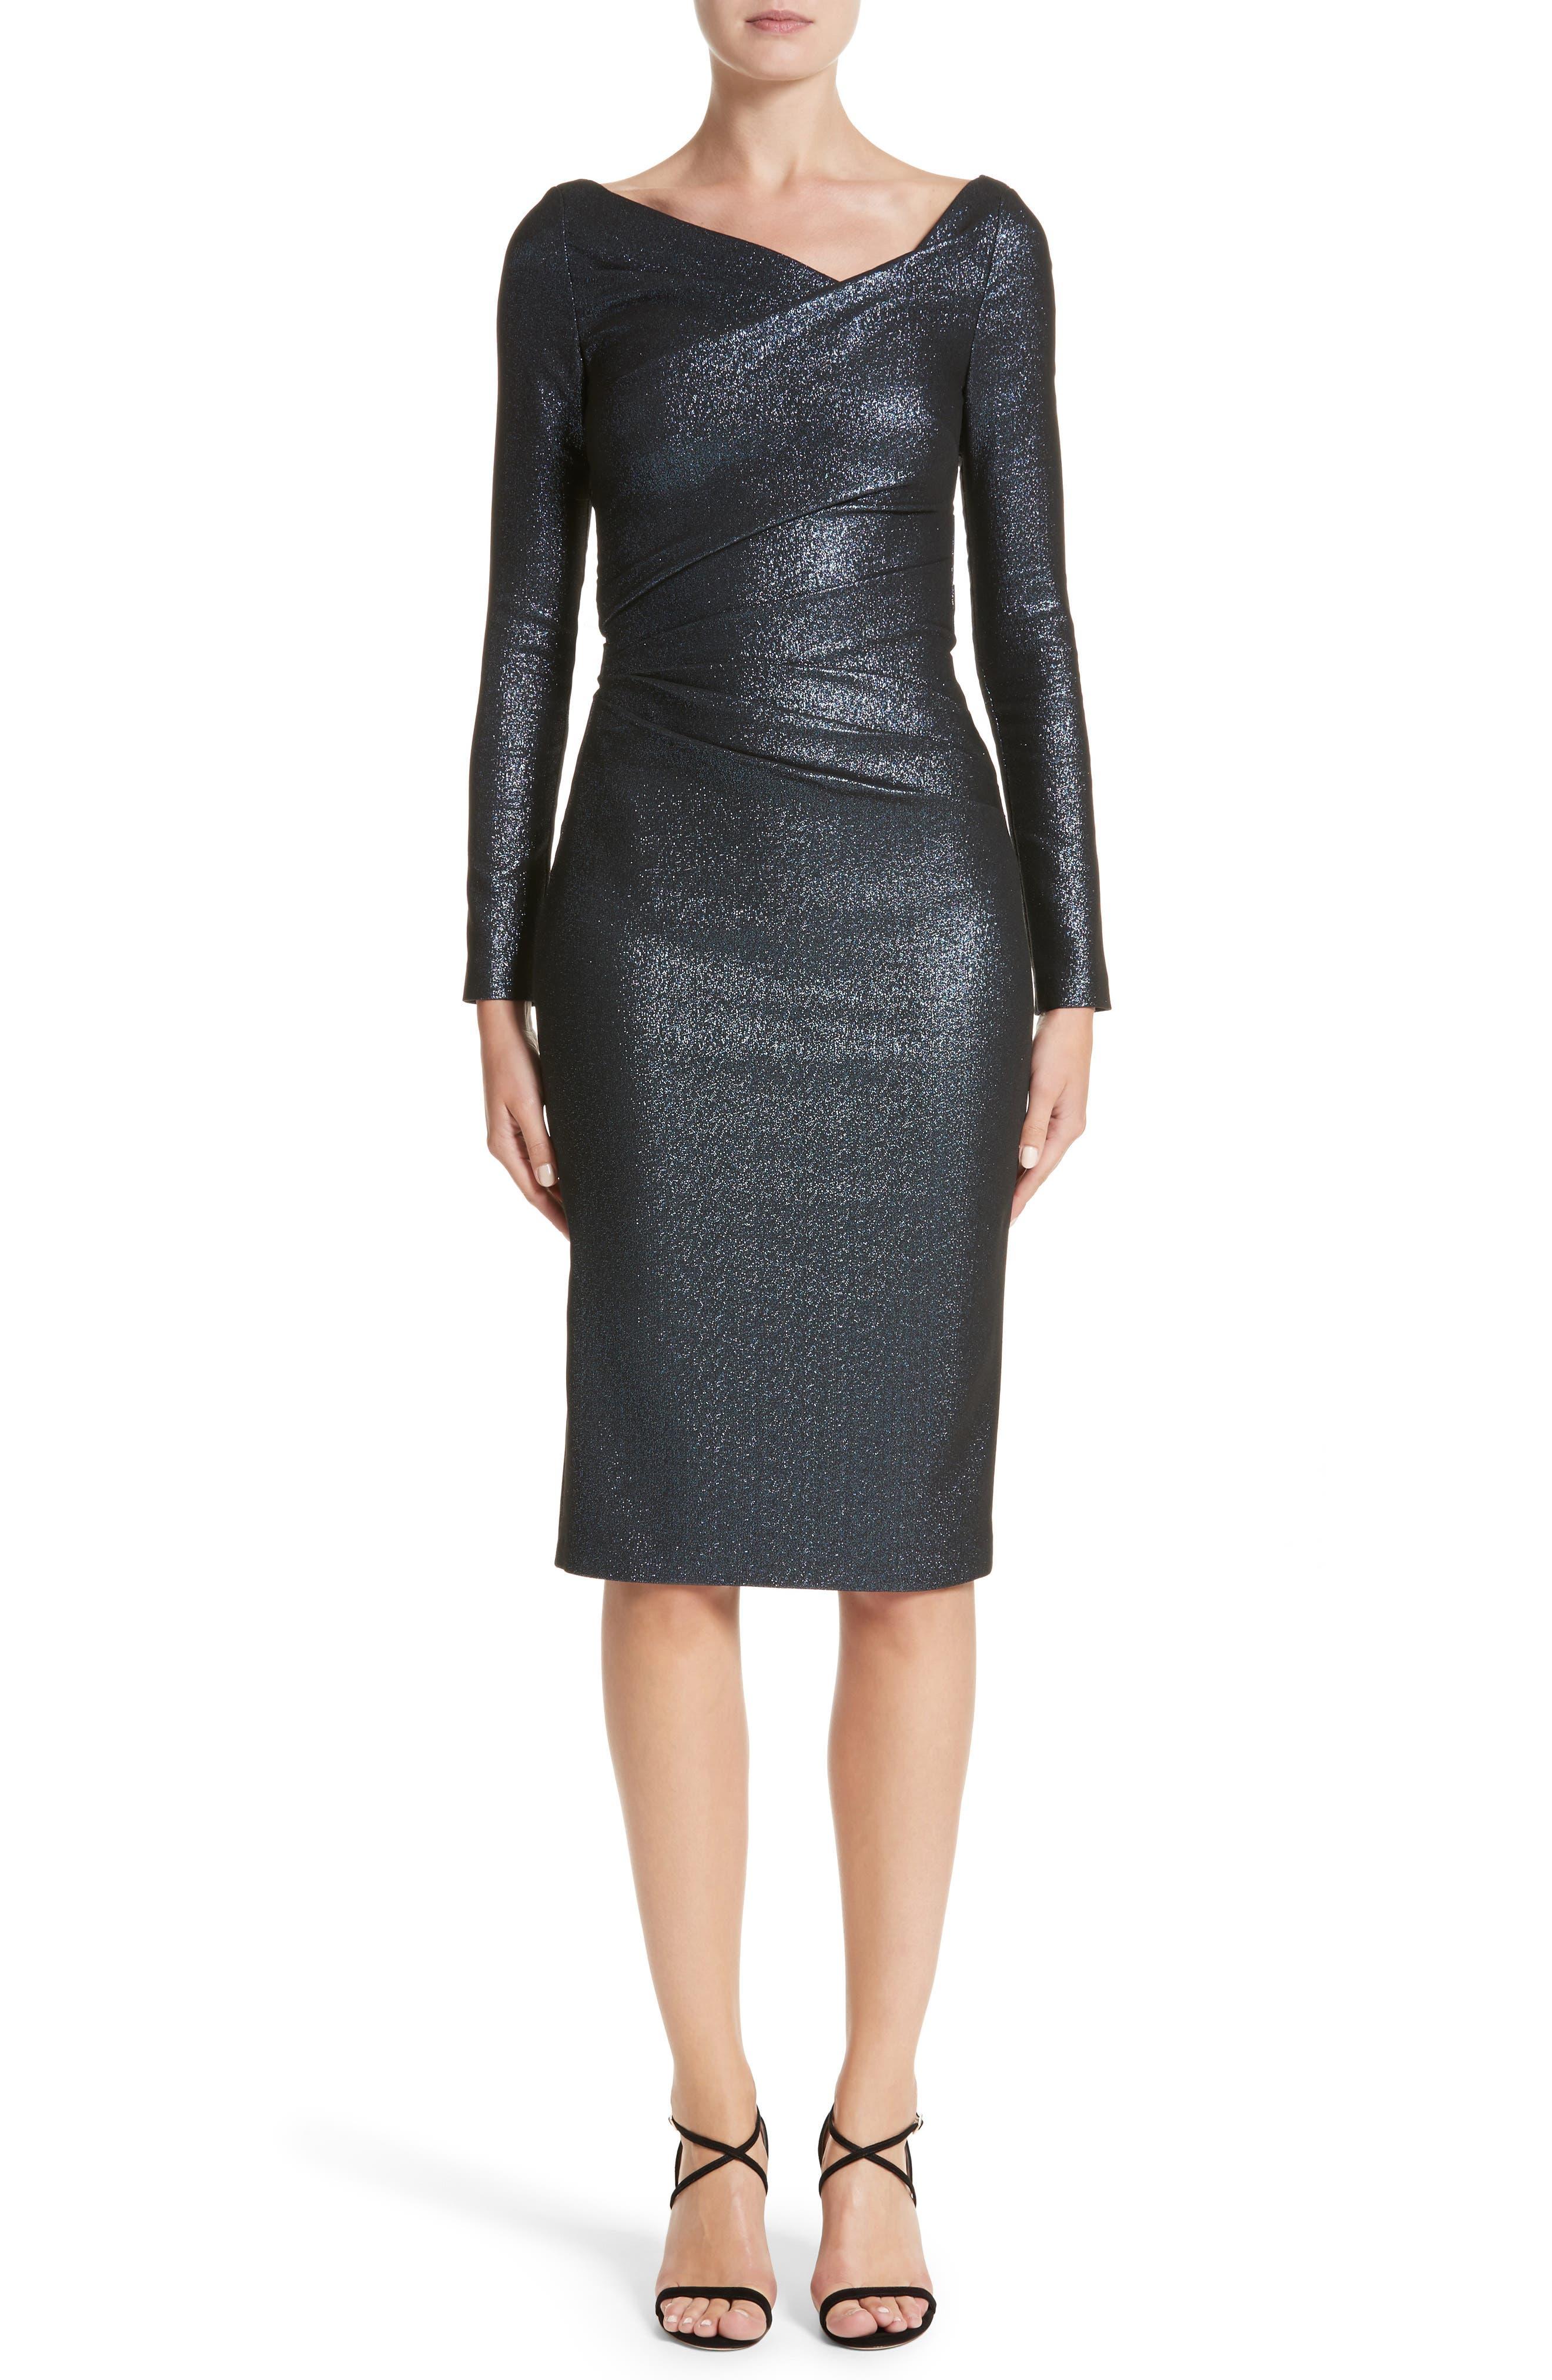 Main Image - Talbot Runhof Metallic Asymmetrical Pleat Cocktail Dress